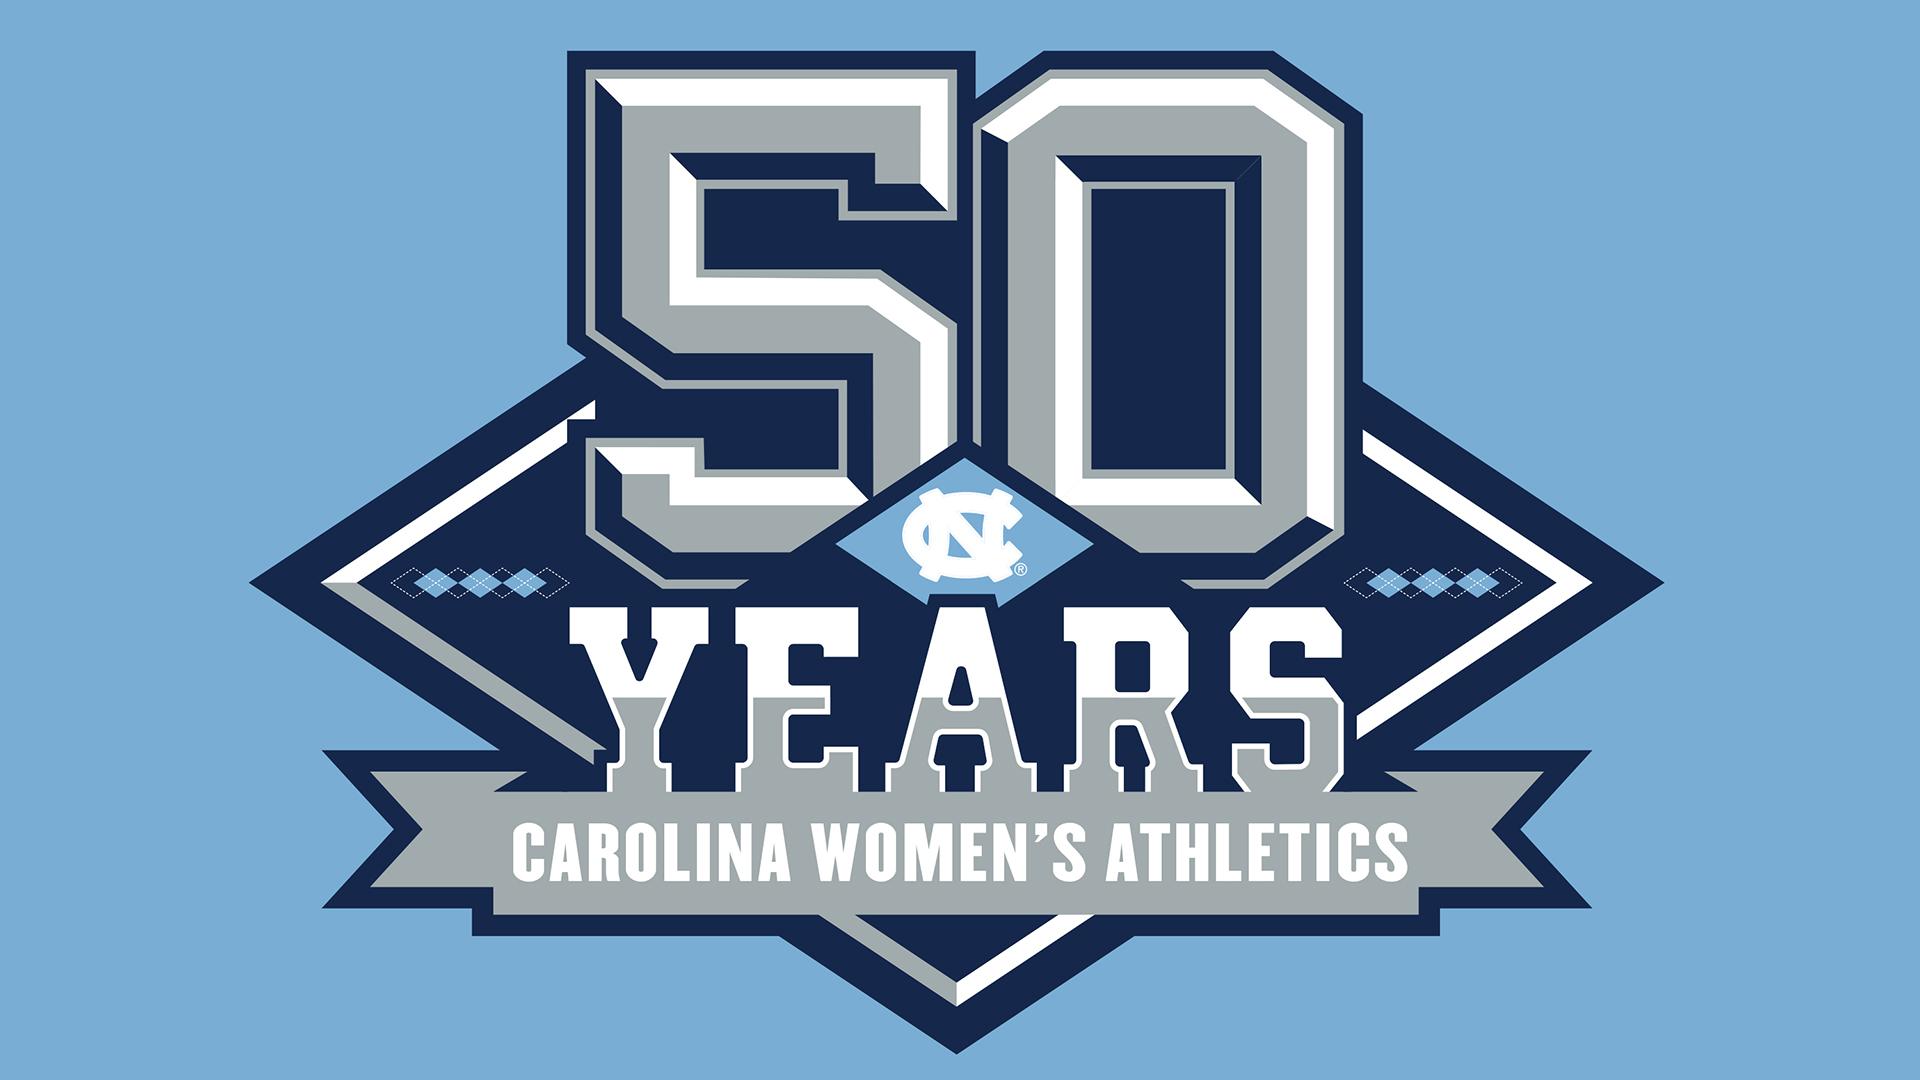 50 years of carolina women's athletics